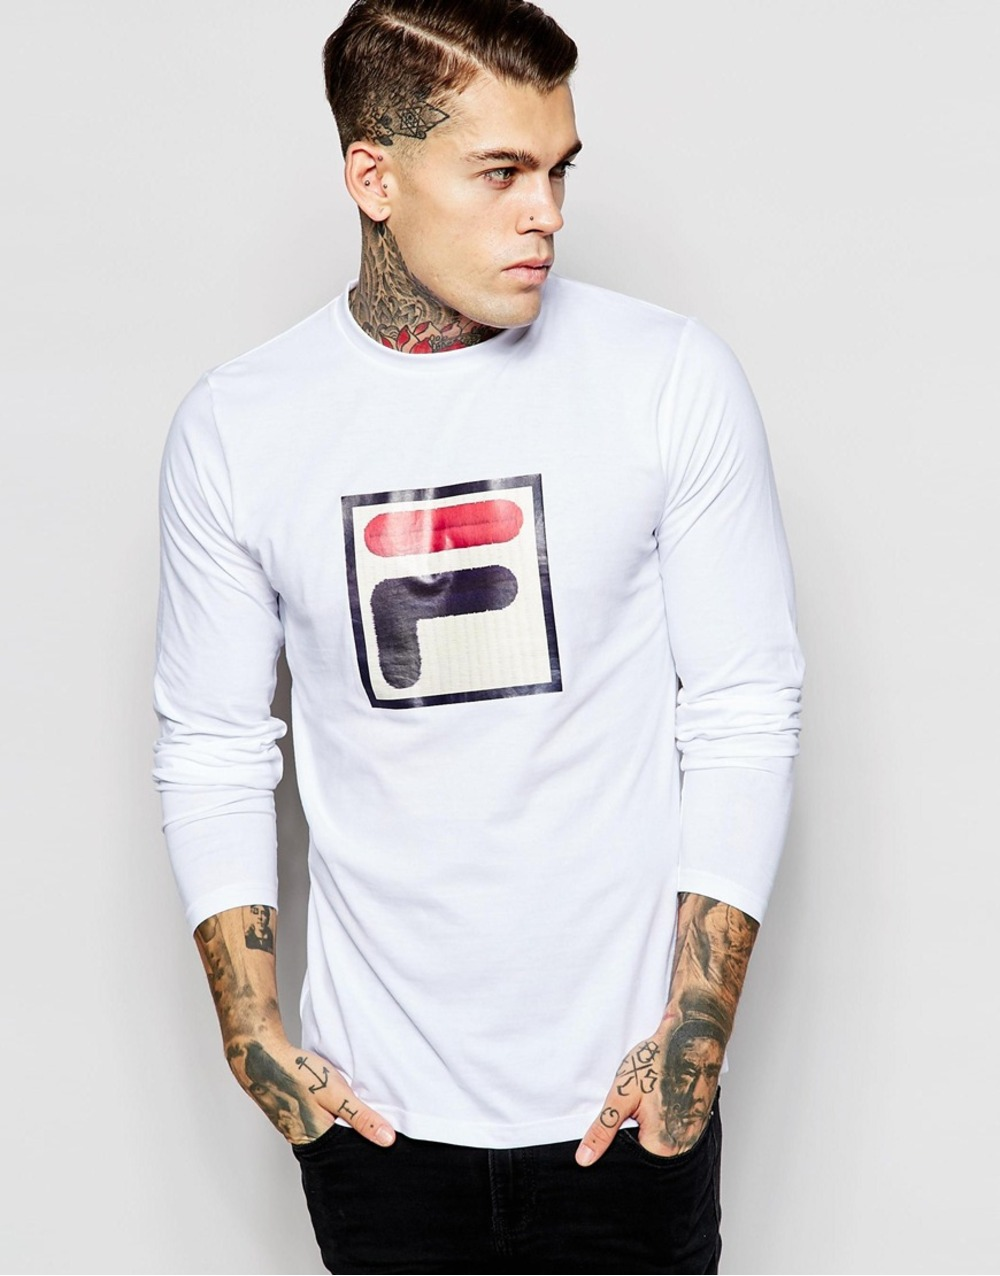 shirts fila white line long sleeve t shirt tshirt big logo. Black Bedroom Furniture Sets. Home Design Ideas